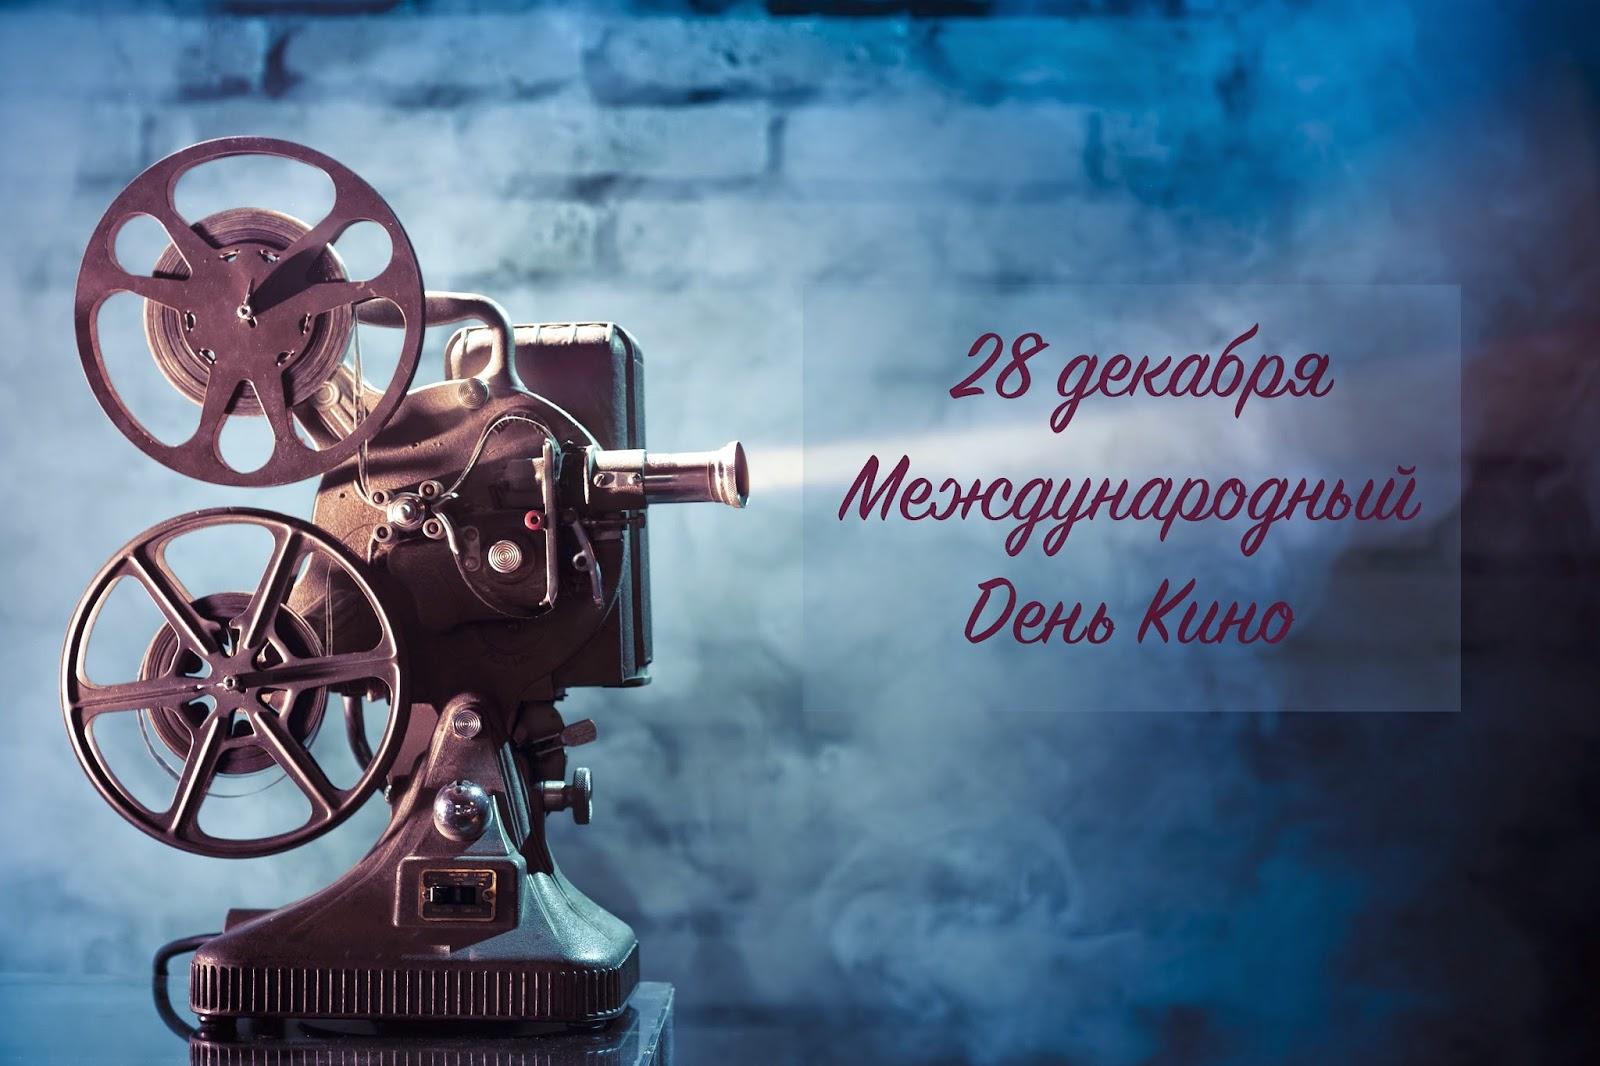 Рождение кинематографа: от Леонардо Да Винчи до Чарльза Чаплина